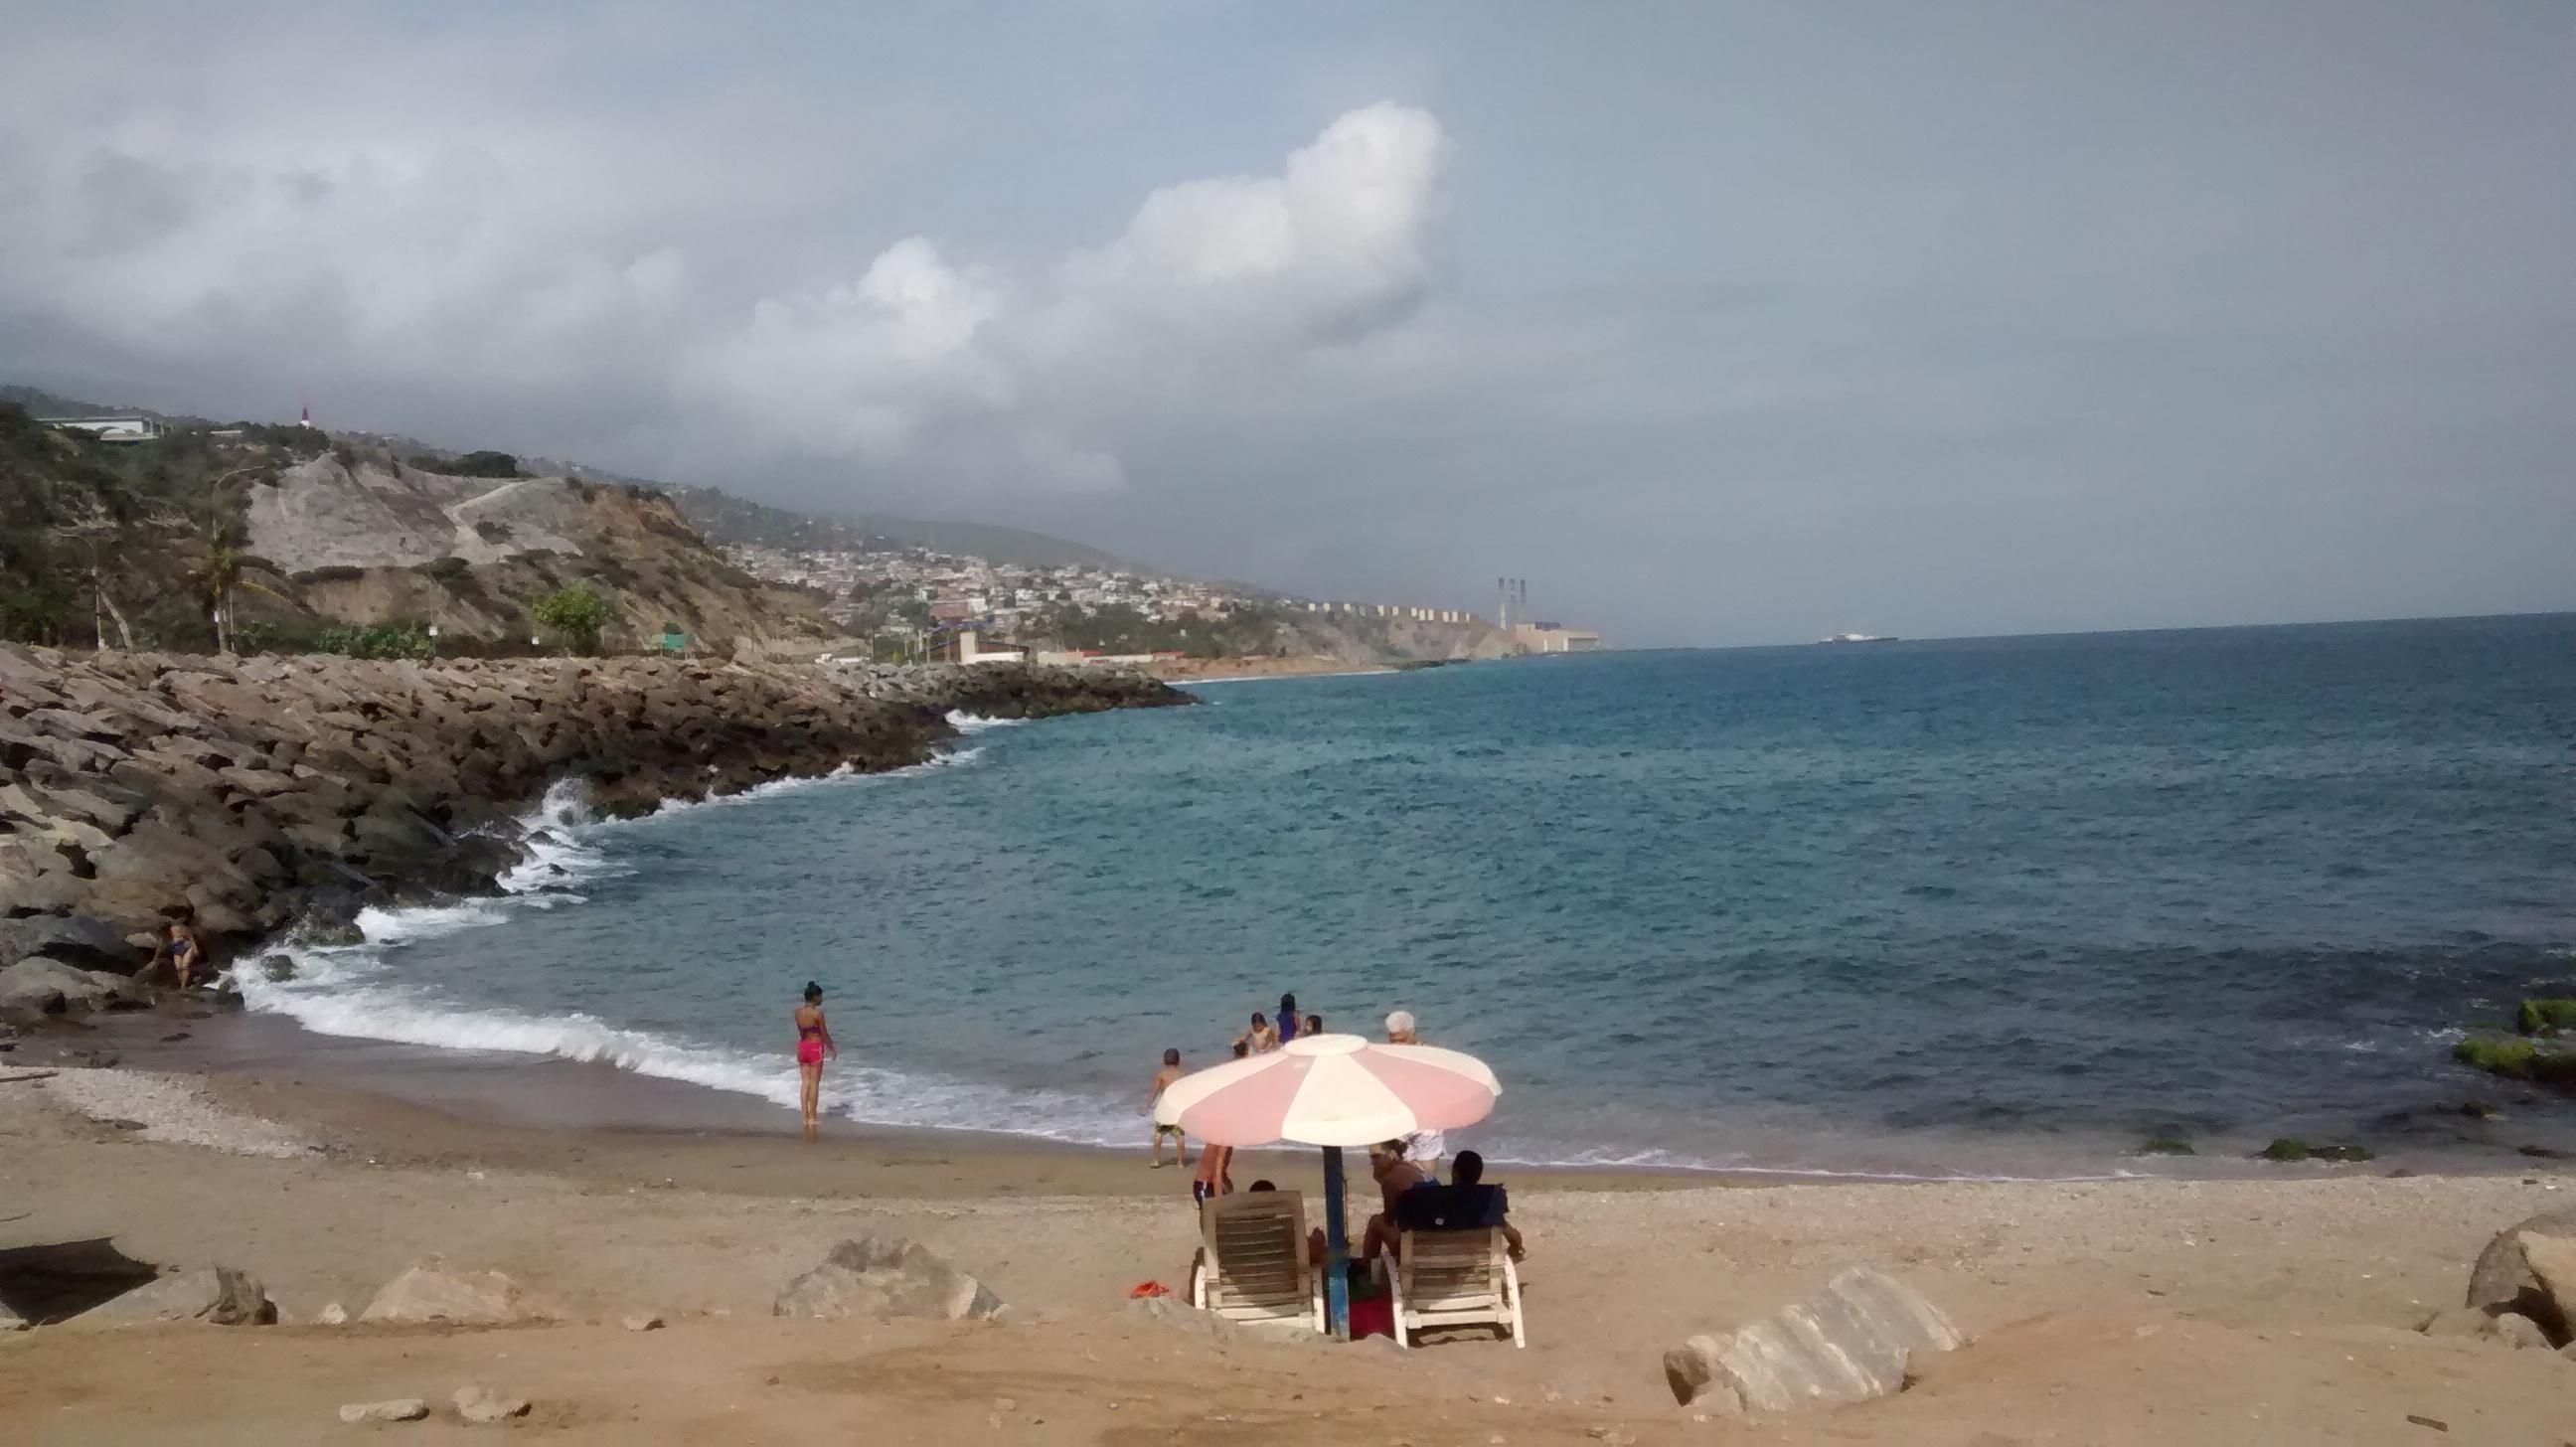 The beach at La Guaira, Vargas, Venezuela.